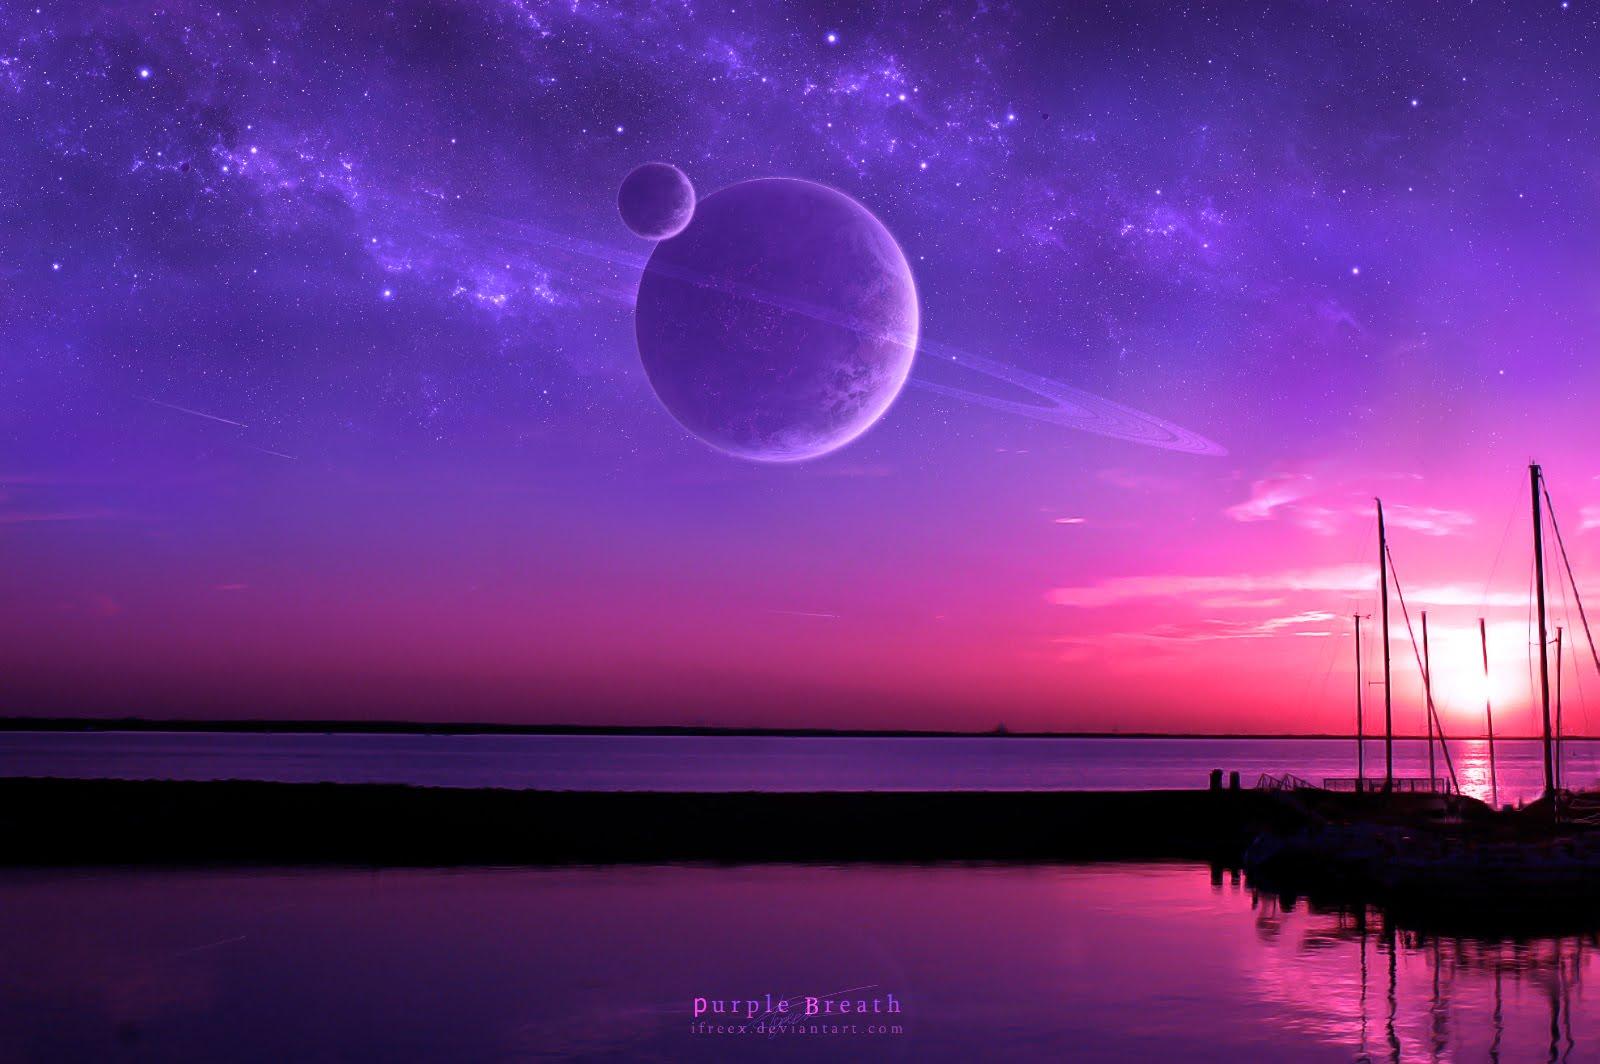 Starry Night Mariacandelaria Purple Sunset